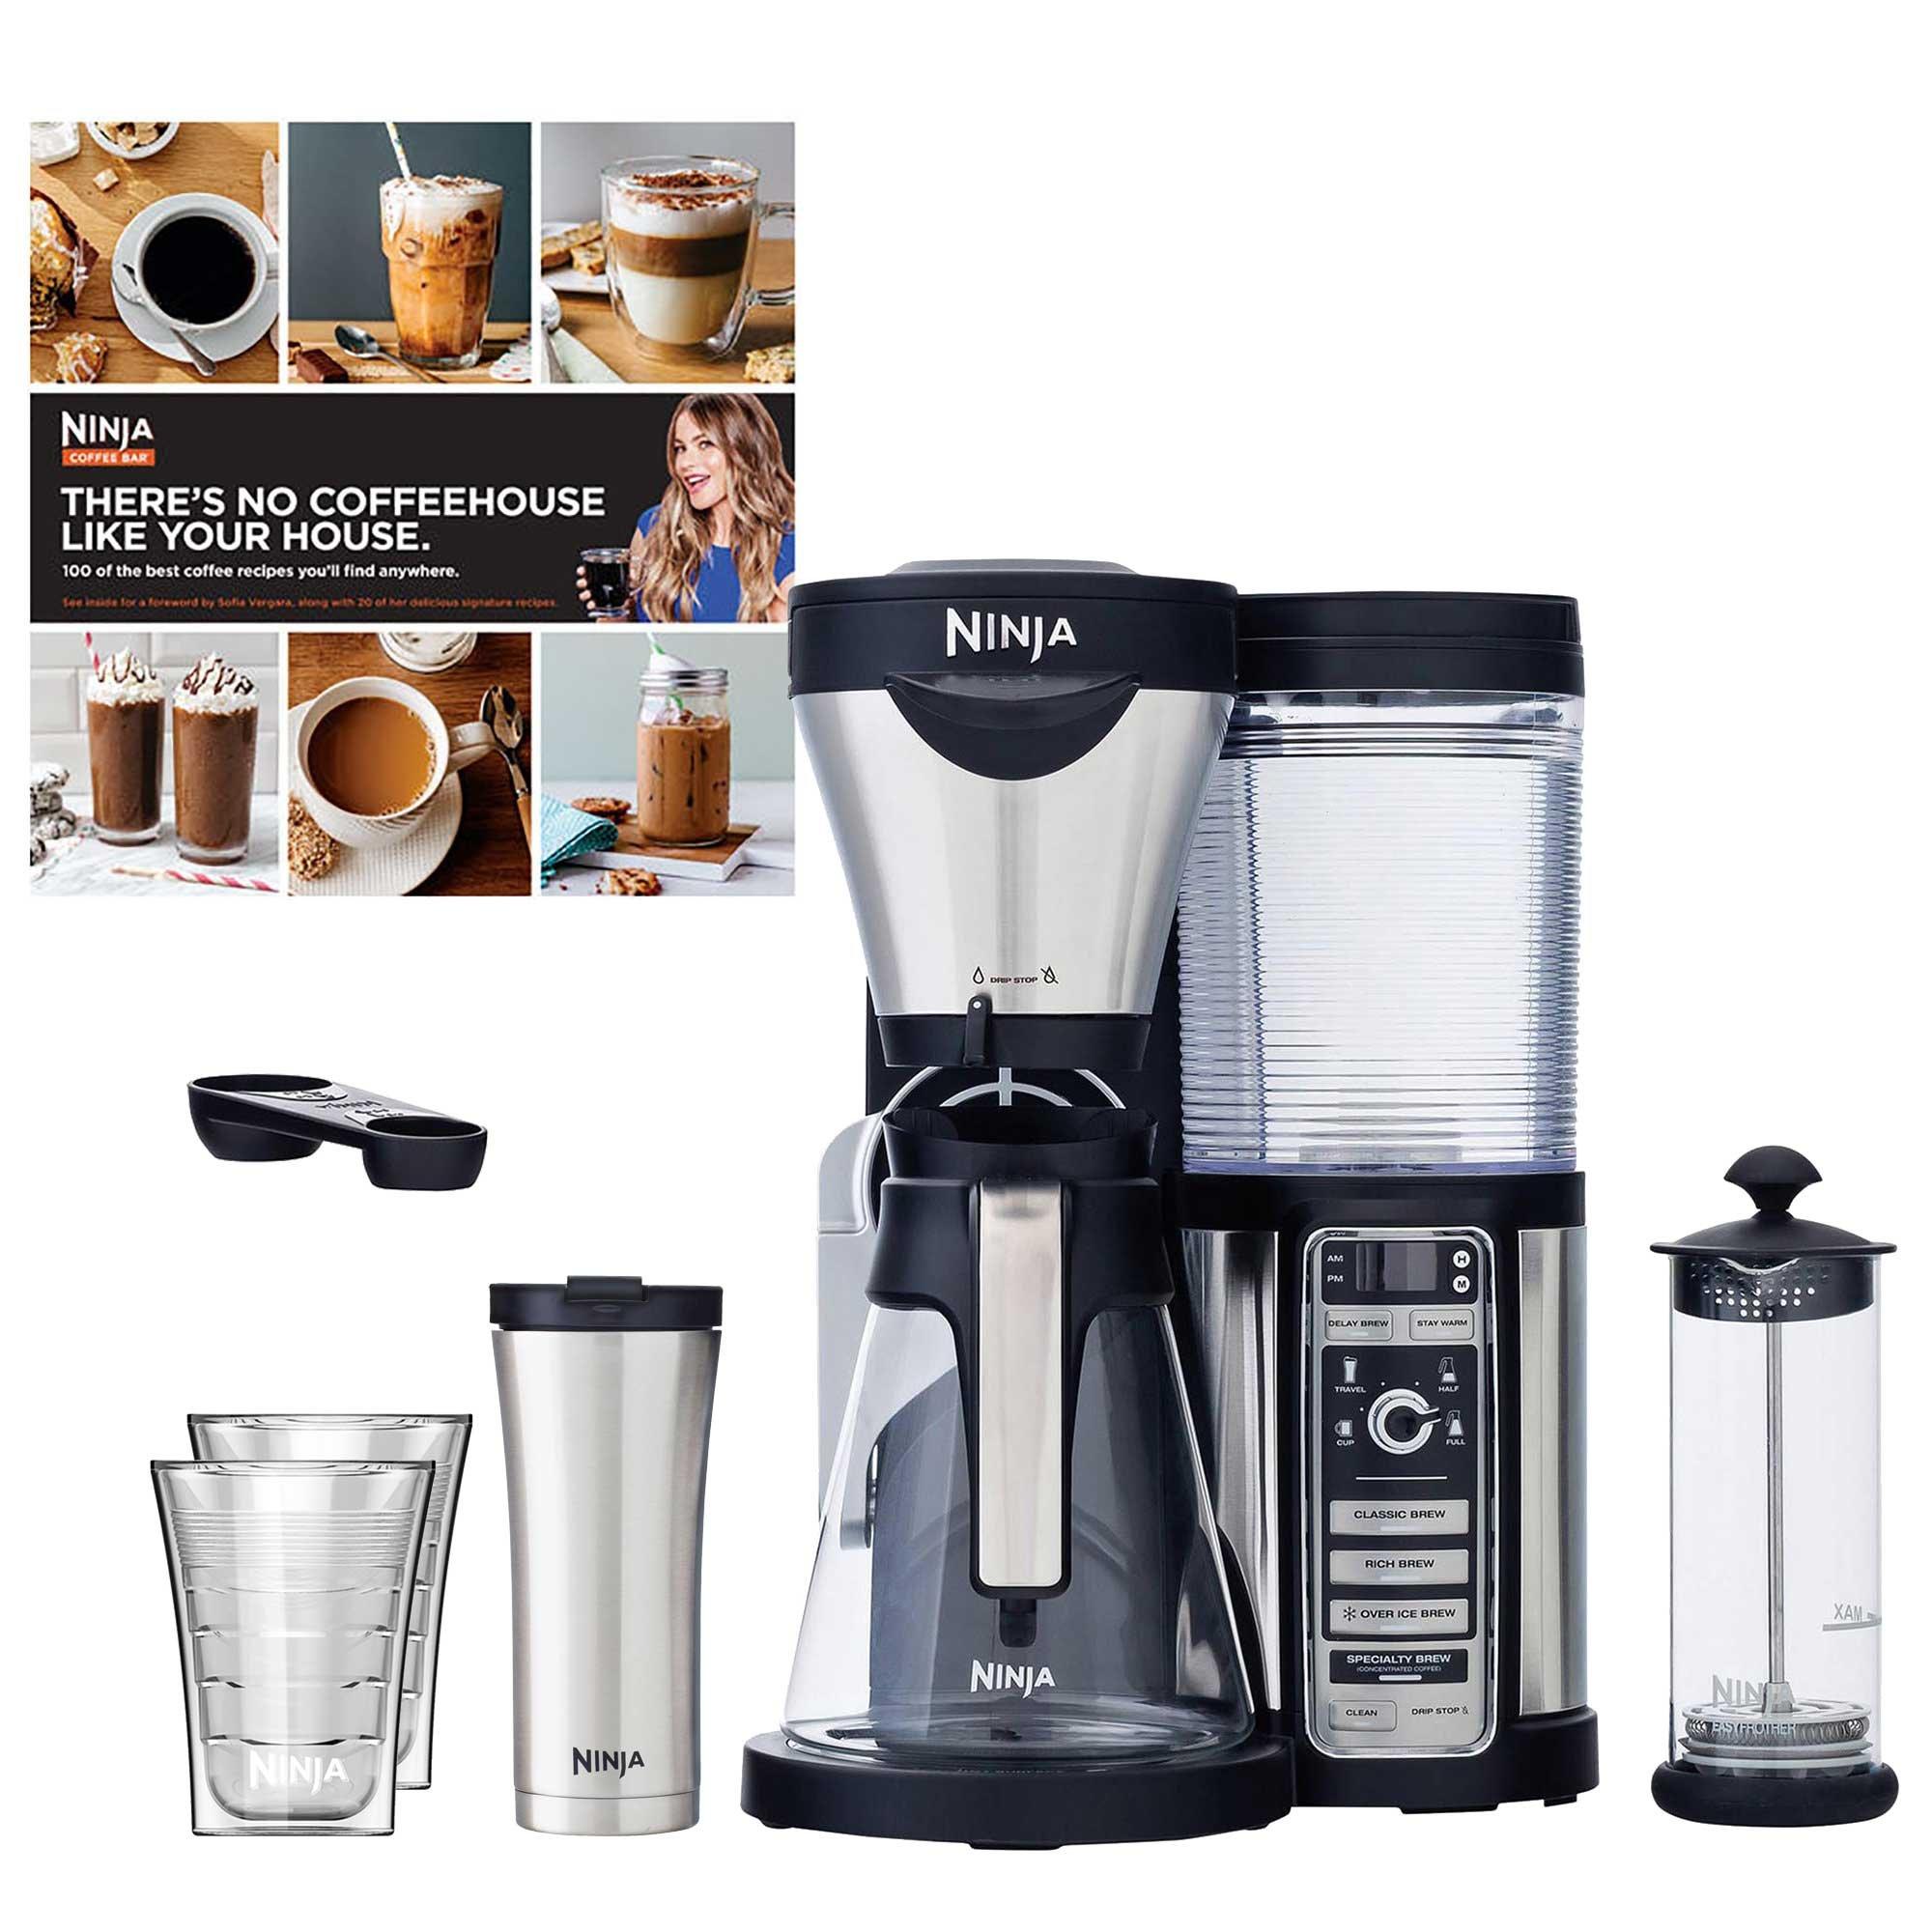 Ninja Coffee Bar + Recipes + Travel Mug + Insulated Cups (Certified Refurbished)